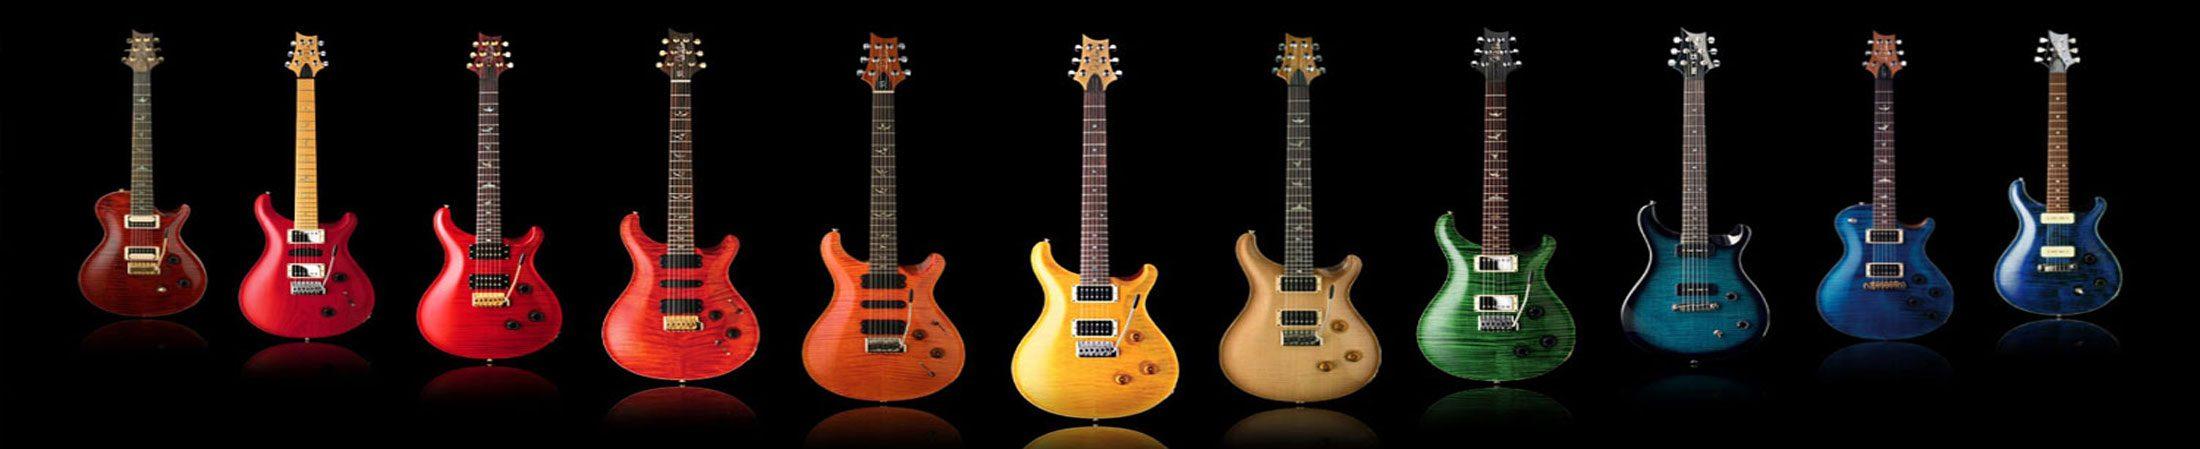 Kell Guitars